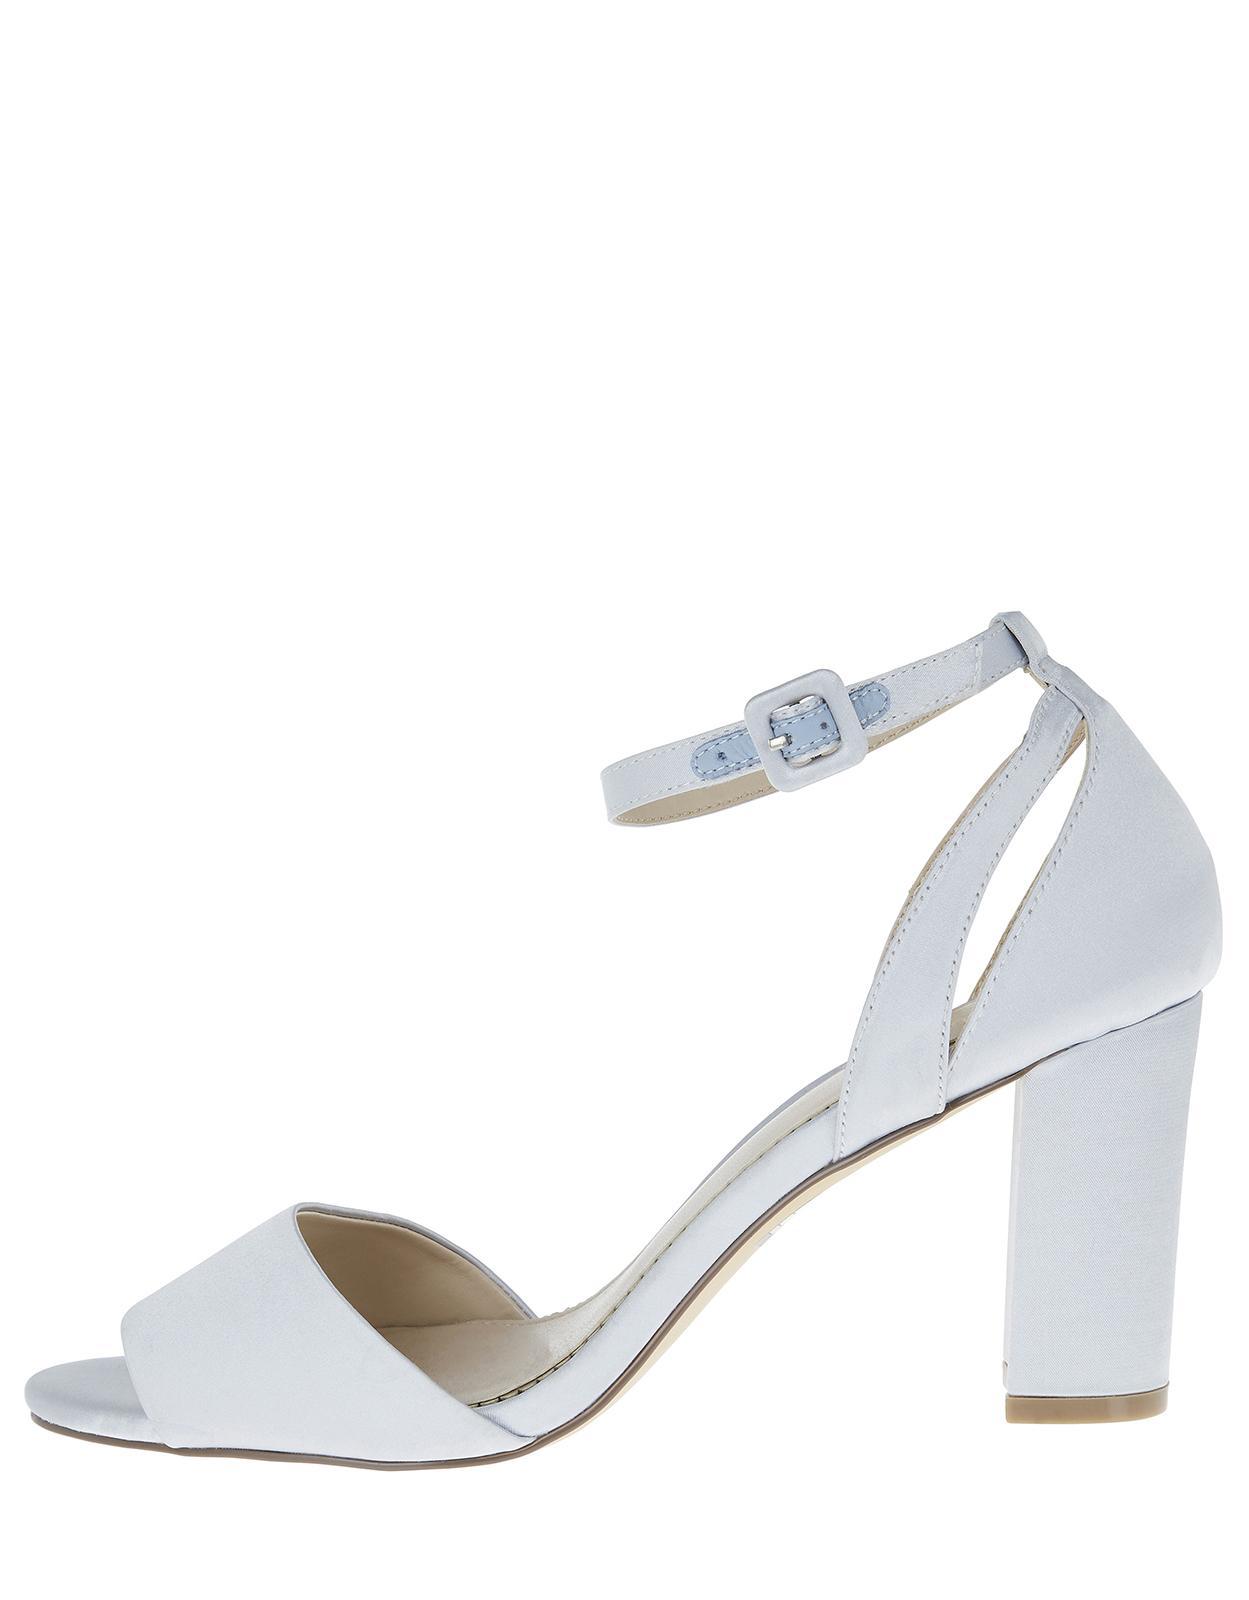 5cc8fb20b Monsoon Blossom Bridesmaid Sandals in Blue - Lyst